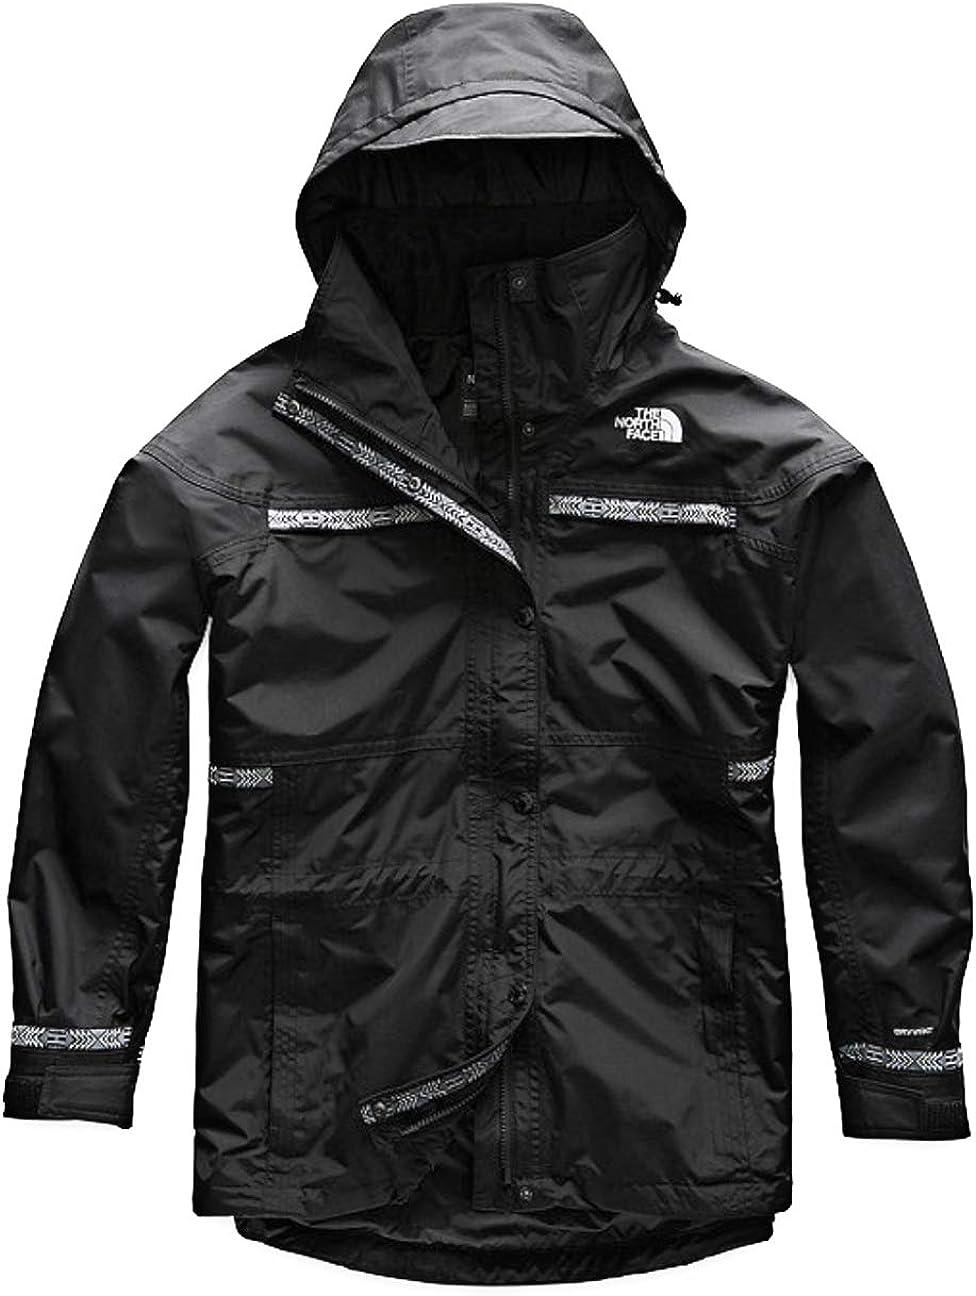 The North Face Men 92 Retro Rage Rain Jacket in TNF Black X-Large